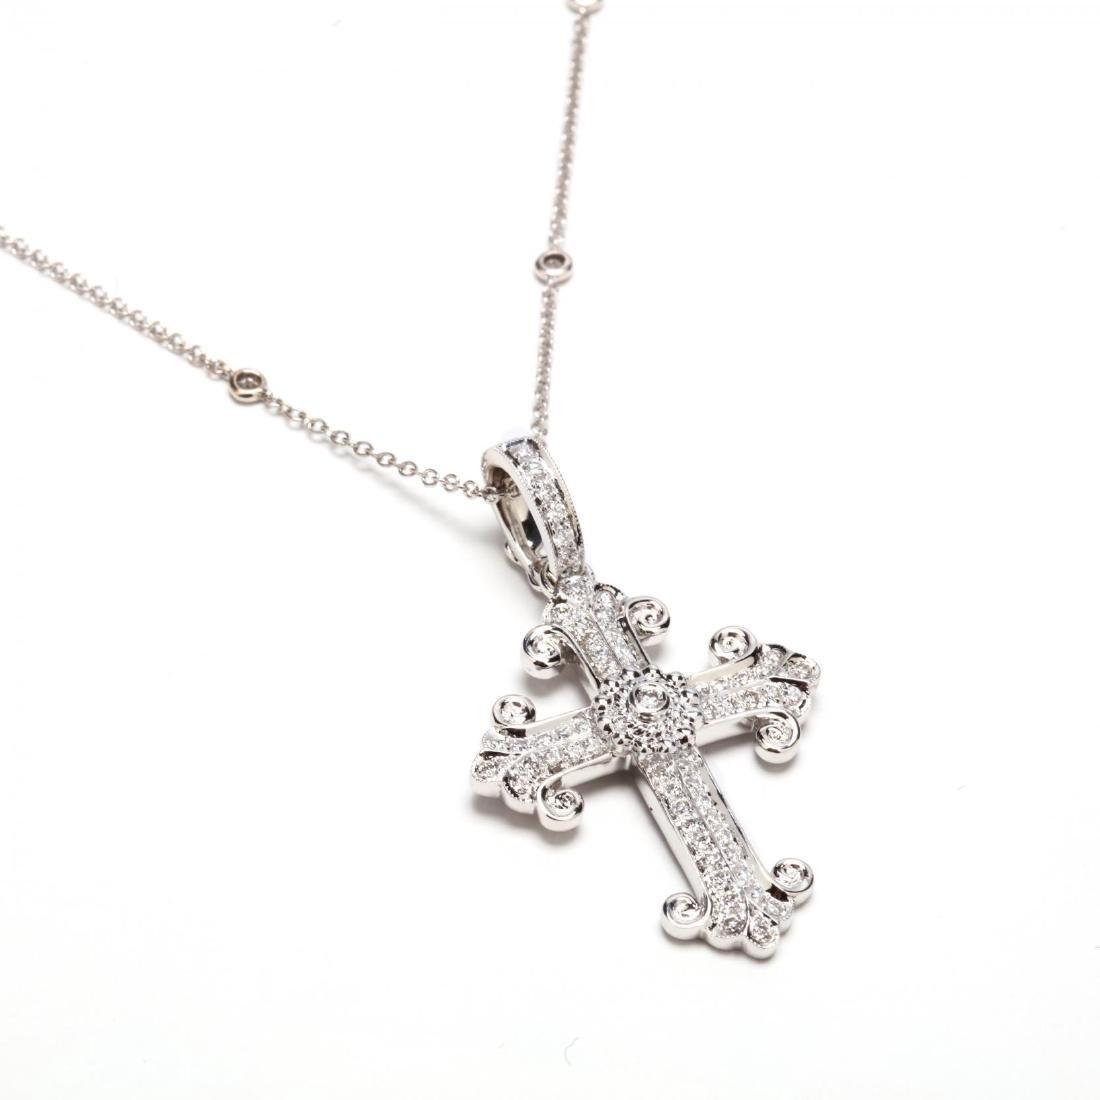 18KT Cross Pendant with 14KT Diamond Station Chain